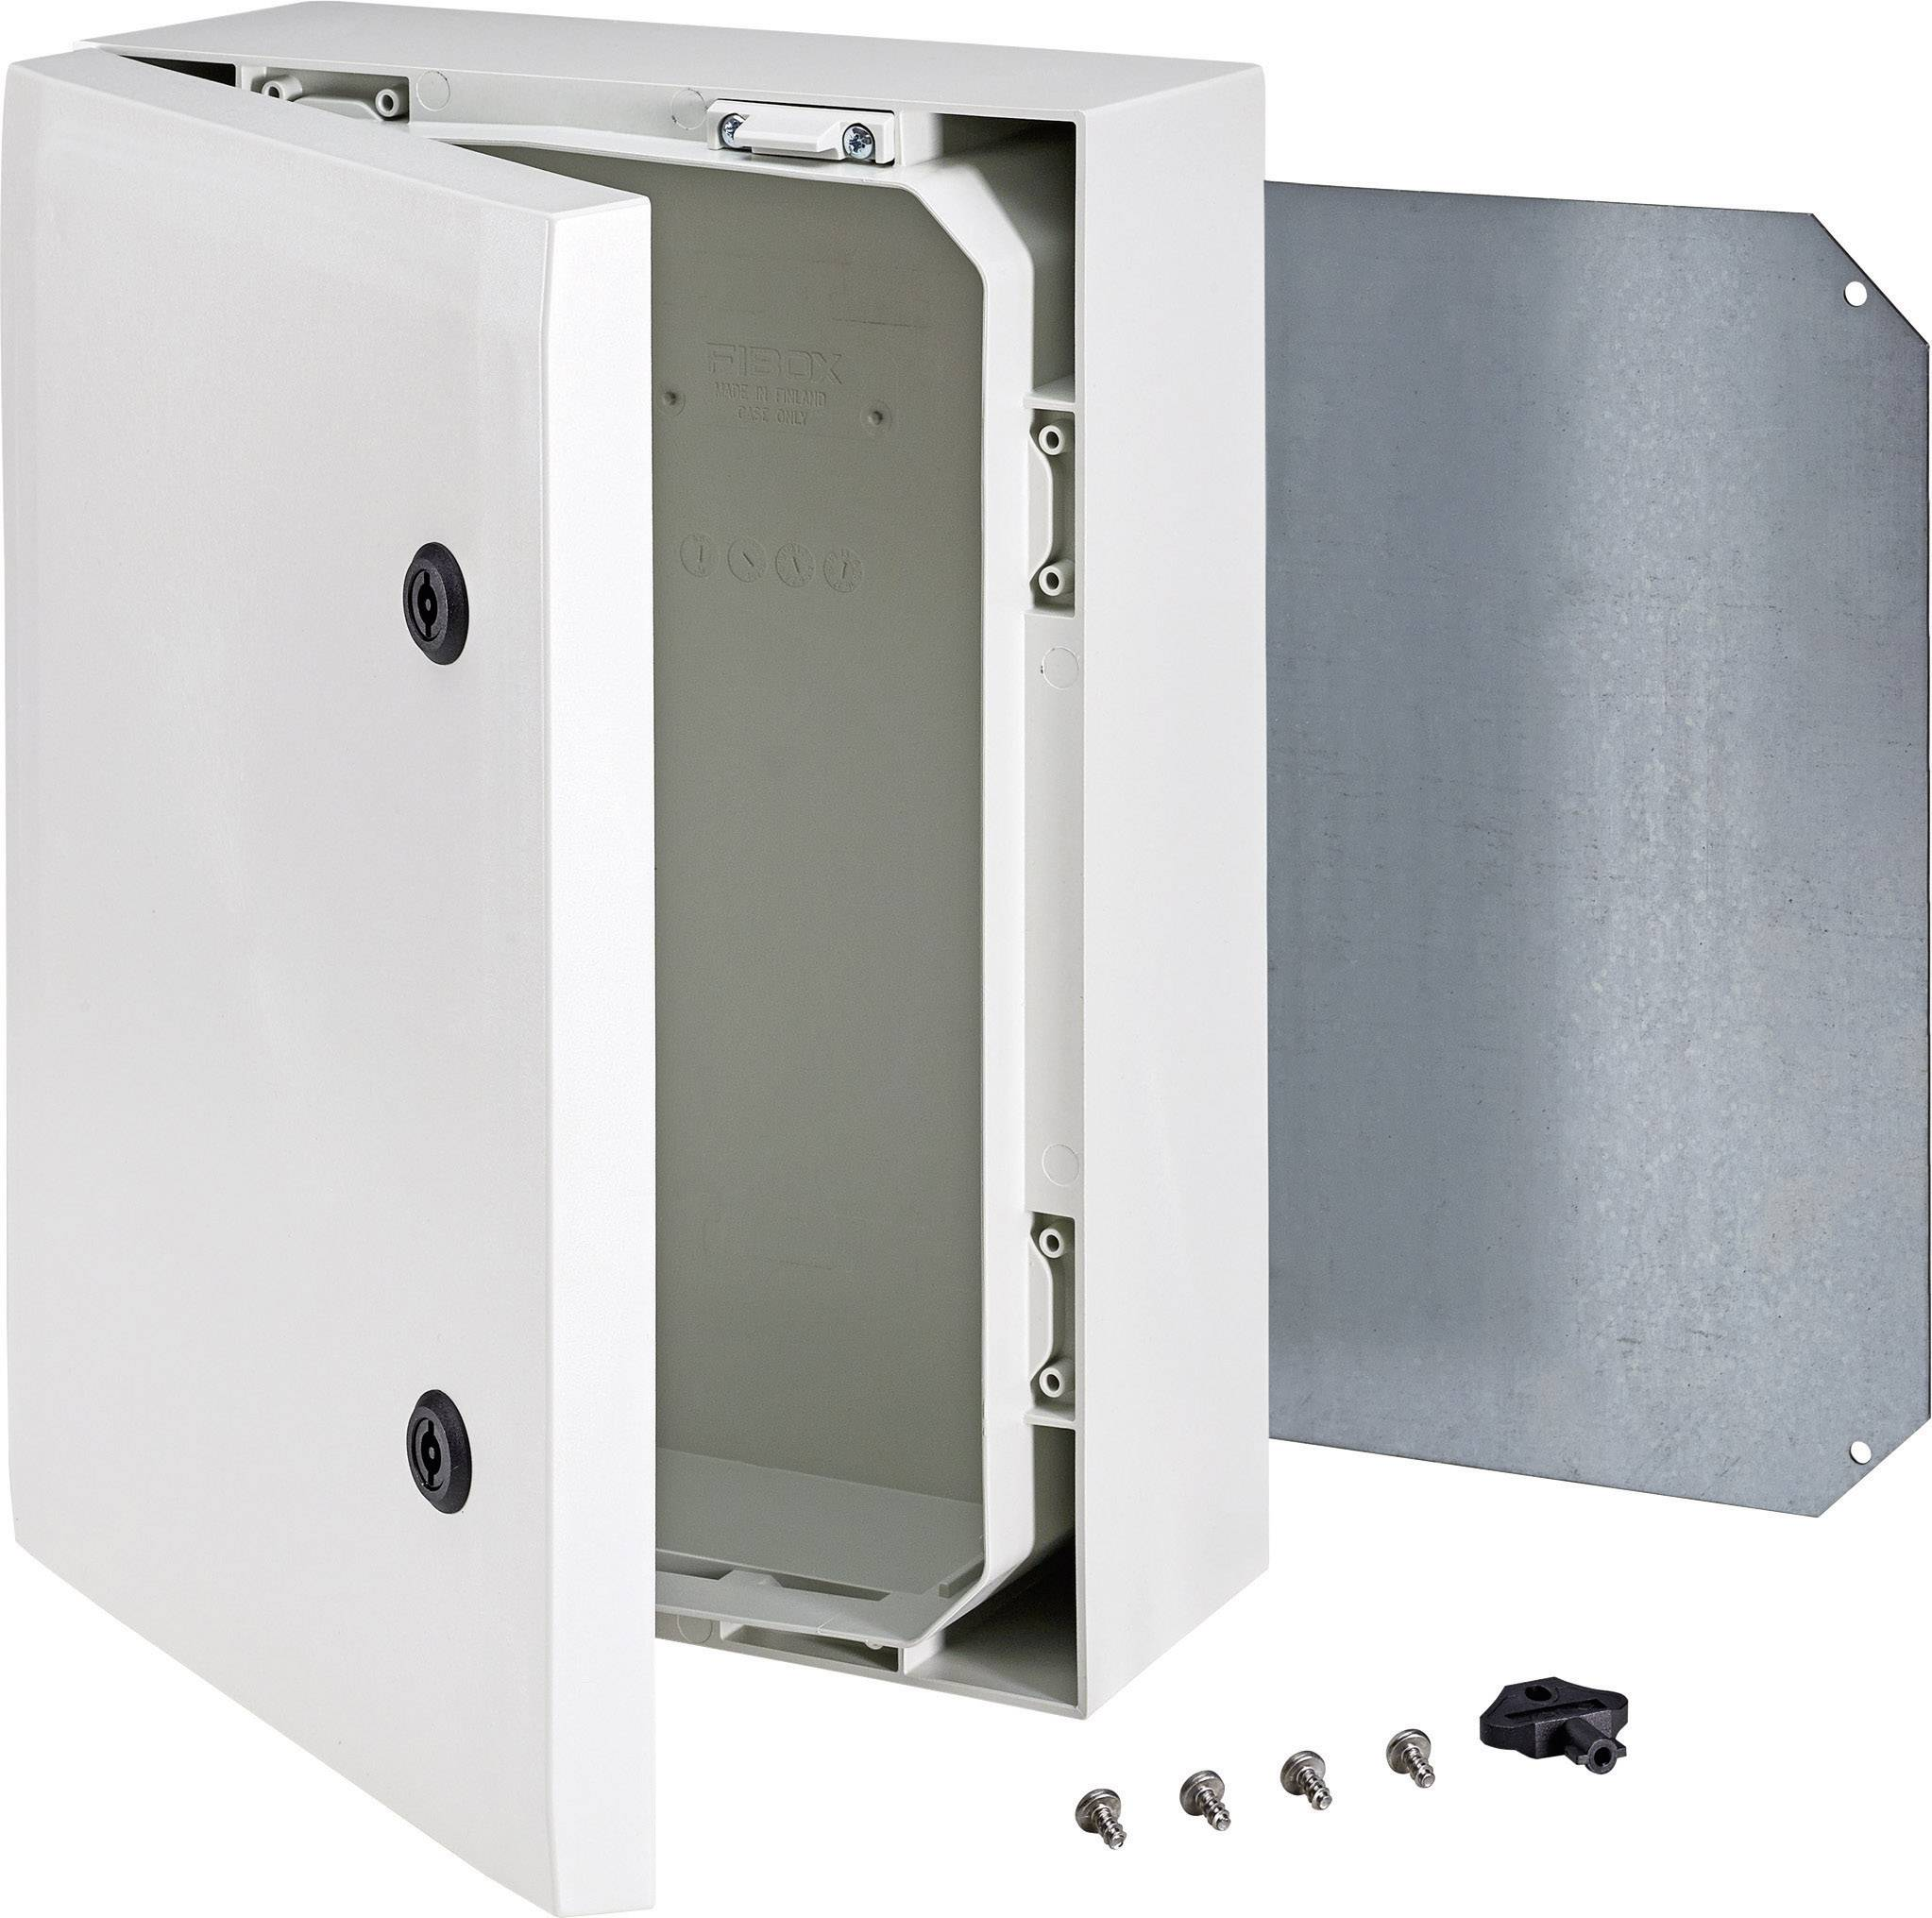 400 x 500 x 210 mm Schaltschrank FIBOX ARCA 405021-8120025